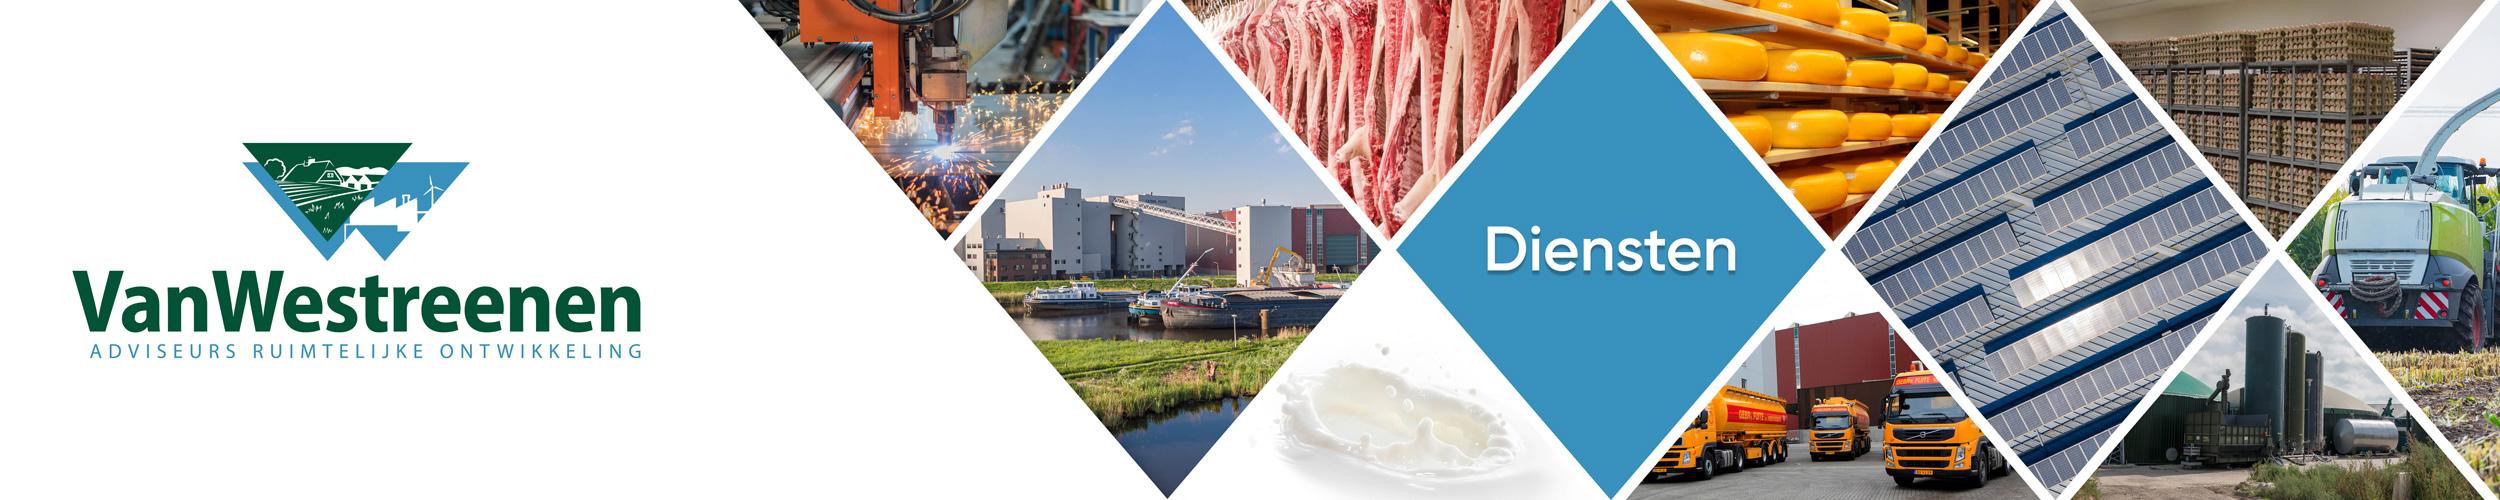 VanWestreenen_Slider_2500x500_Corr2_Diensten_Food_en_Industries